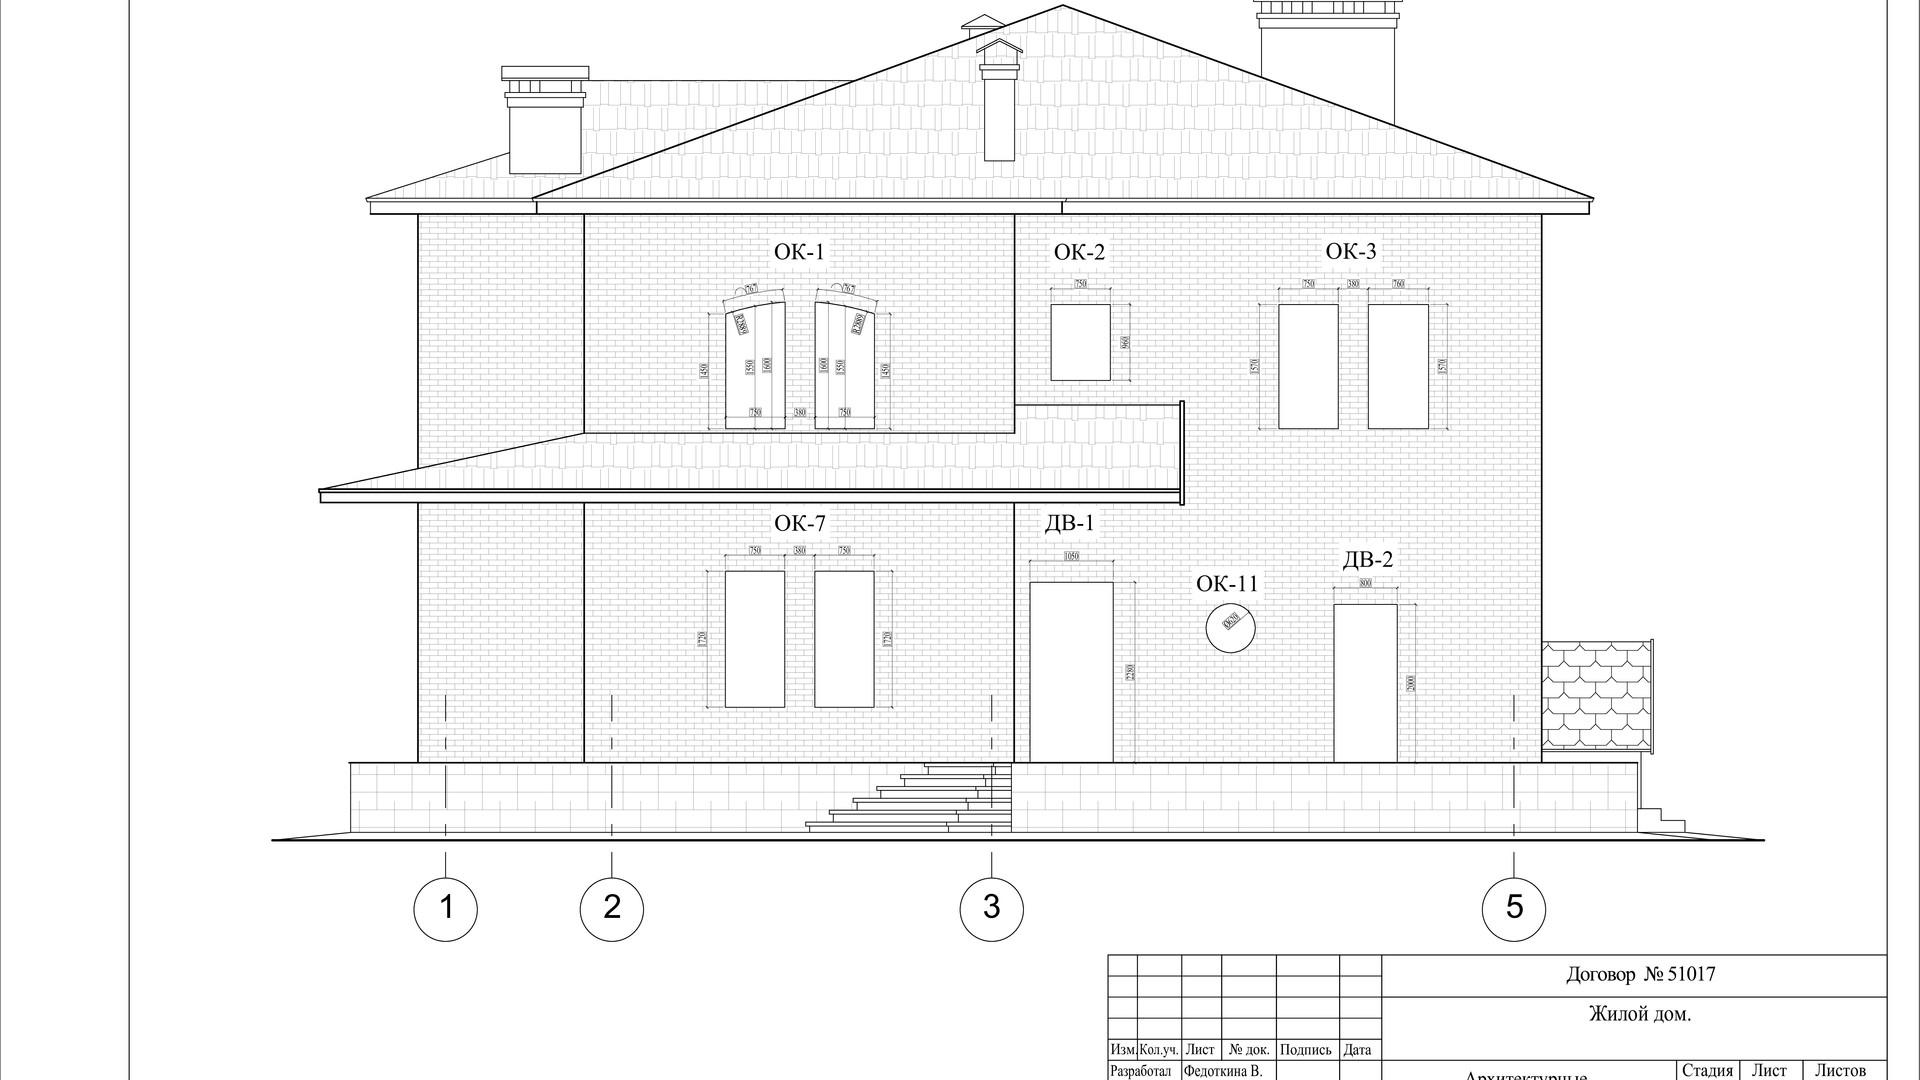 3. Фасад 1-5_обмеры_А2 (pdf.io).jpg